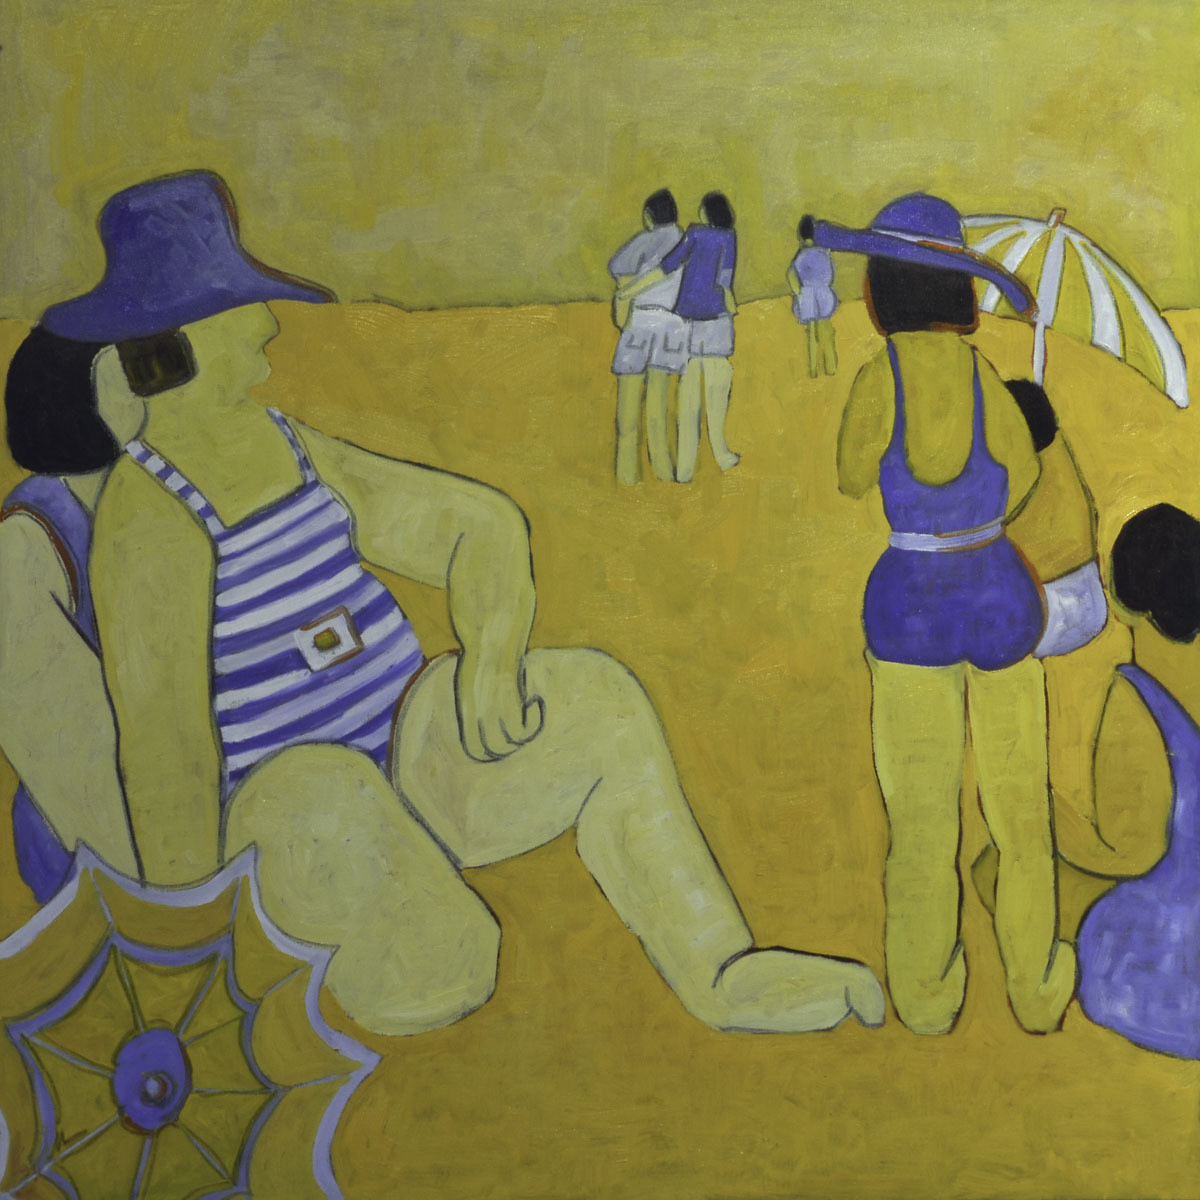 Sun Bathers by the Coast, 36x36, 2018